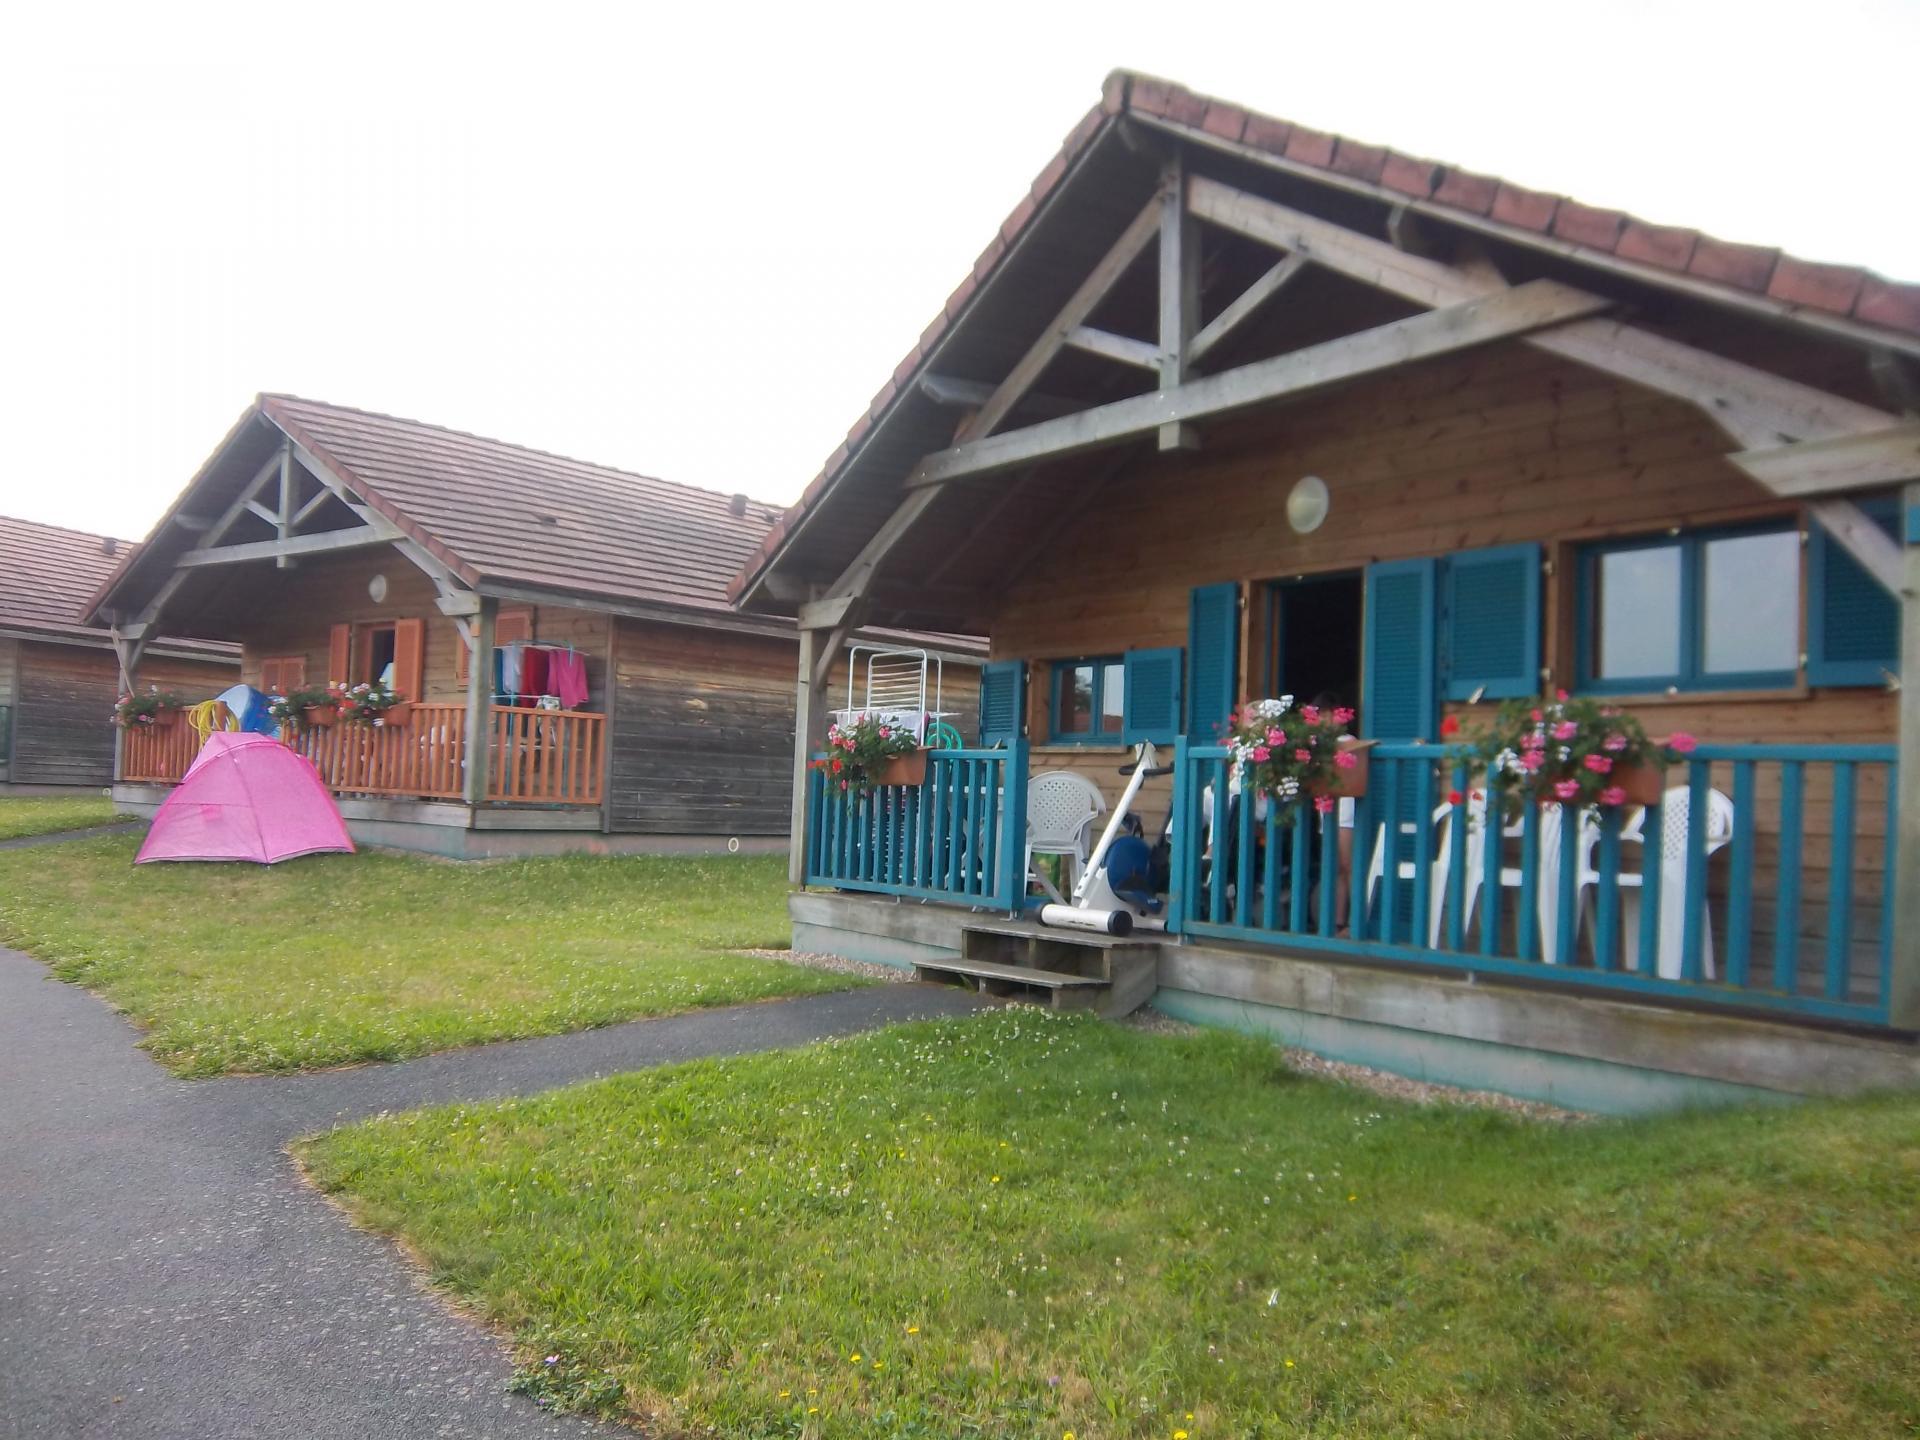 Camping saison 2014 135